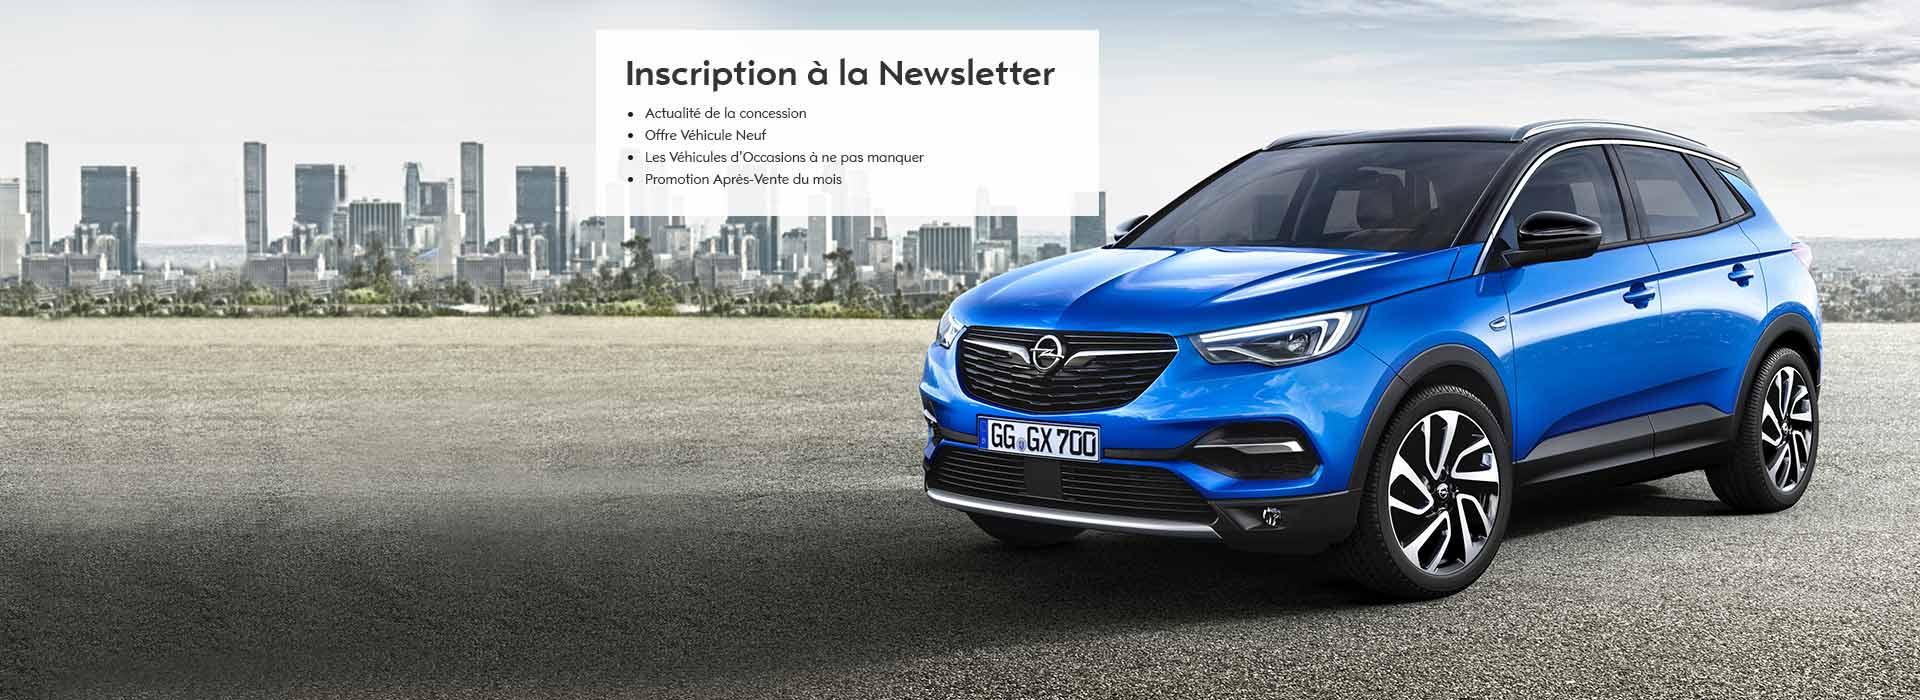 Opel annemasse concessionnaire garage haute savoie 74 - Garage opel haute savoie ...